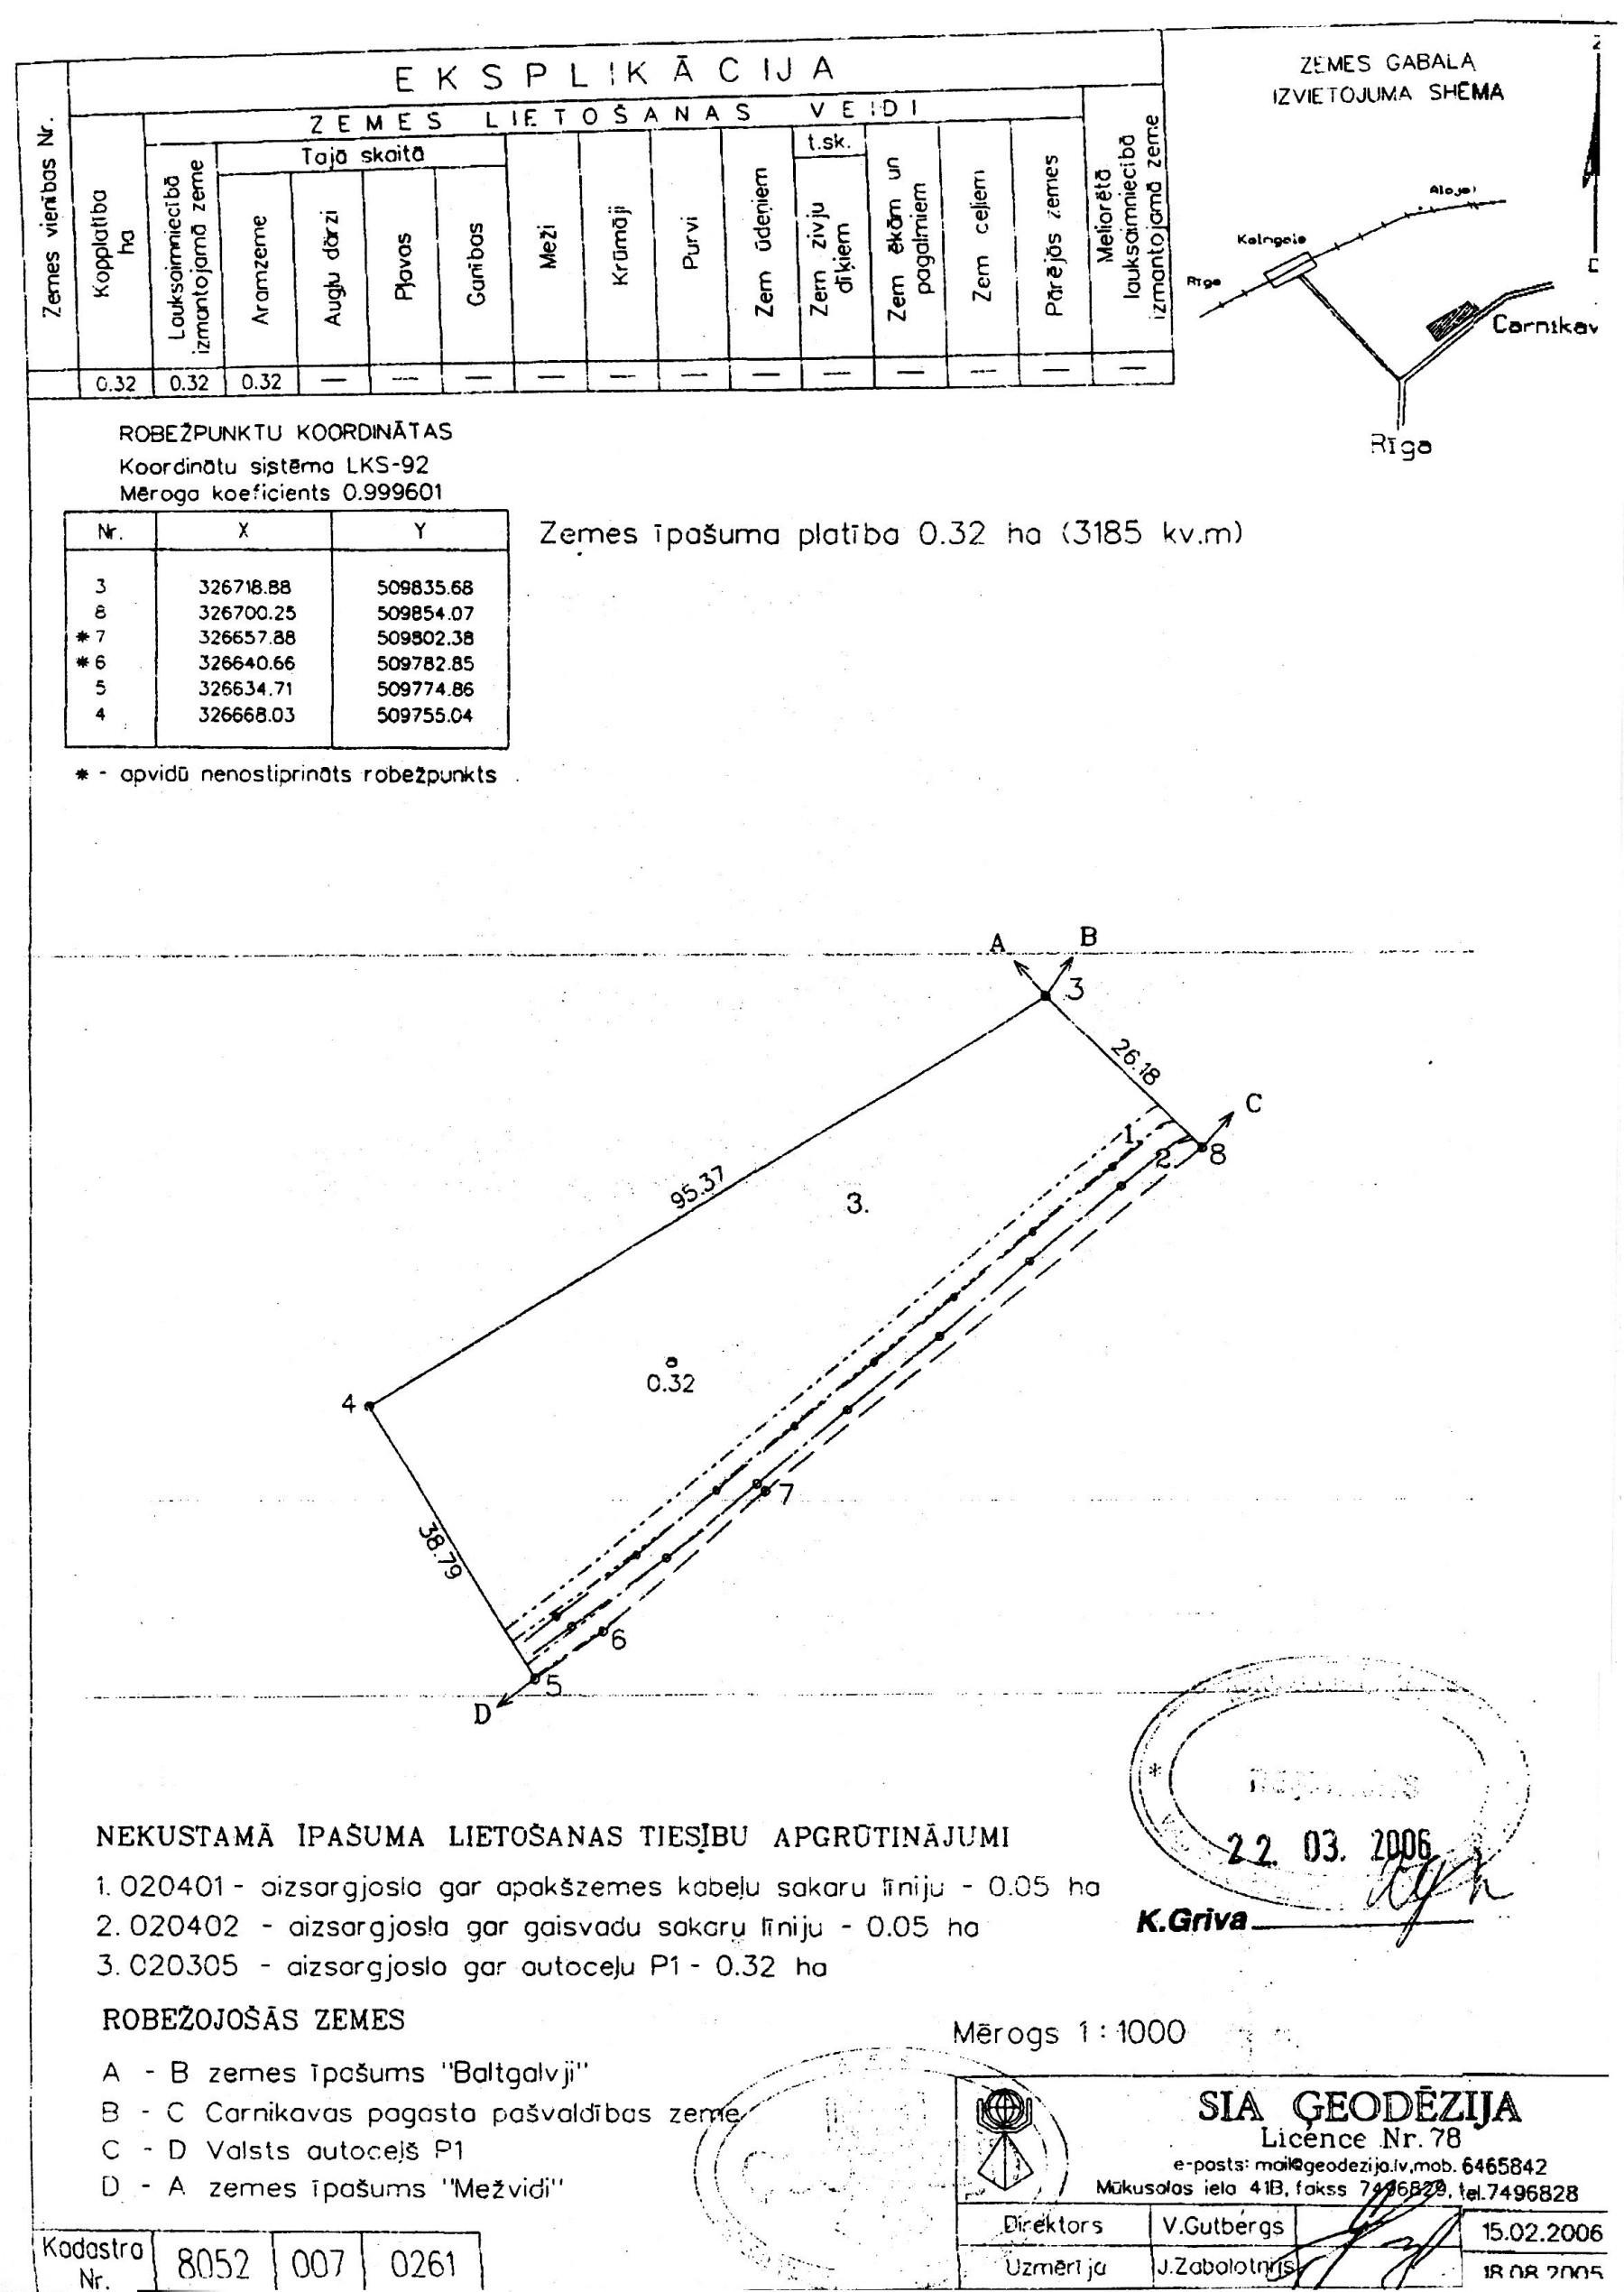 CARNIKAVAS, KALNGALE